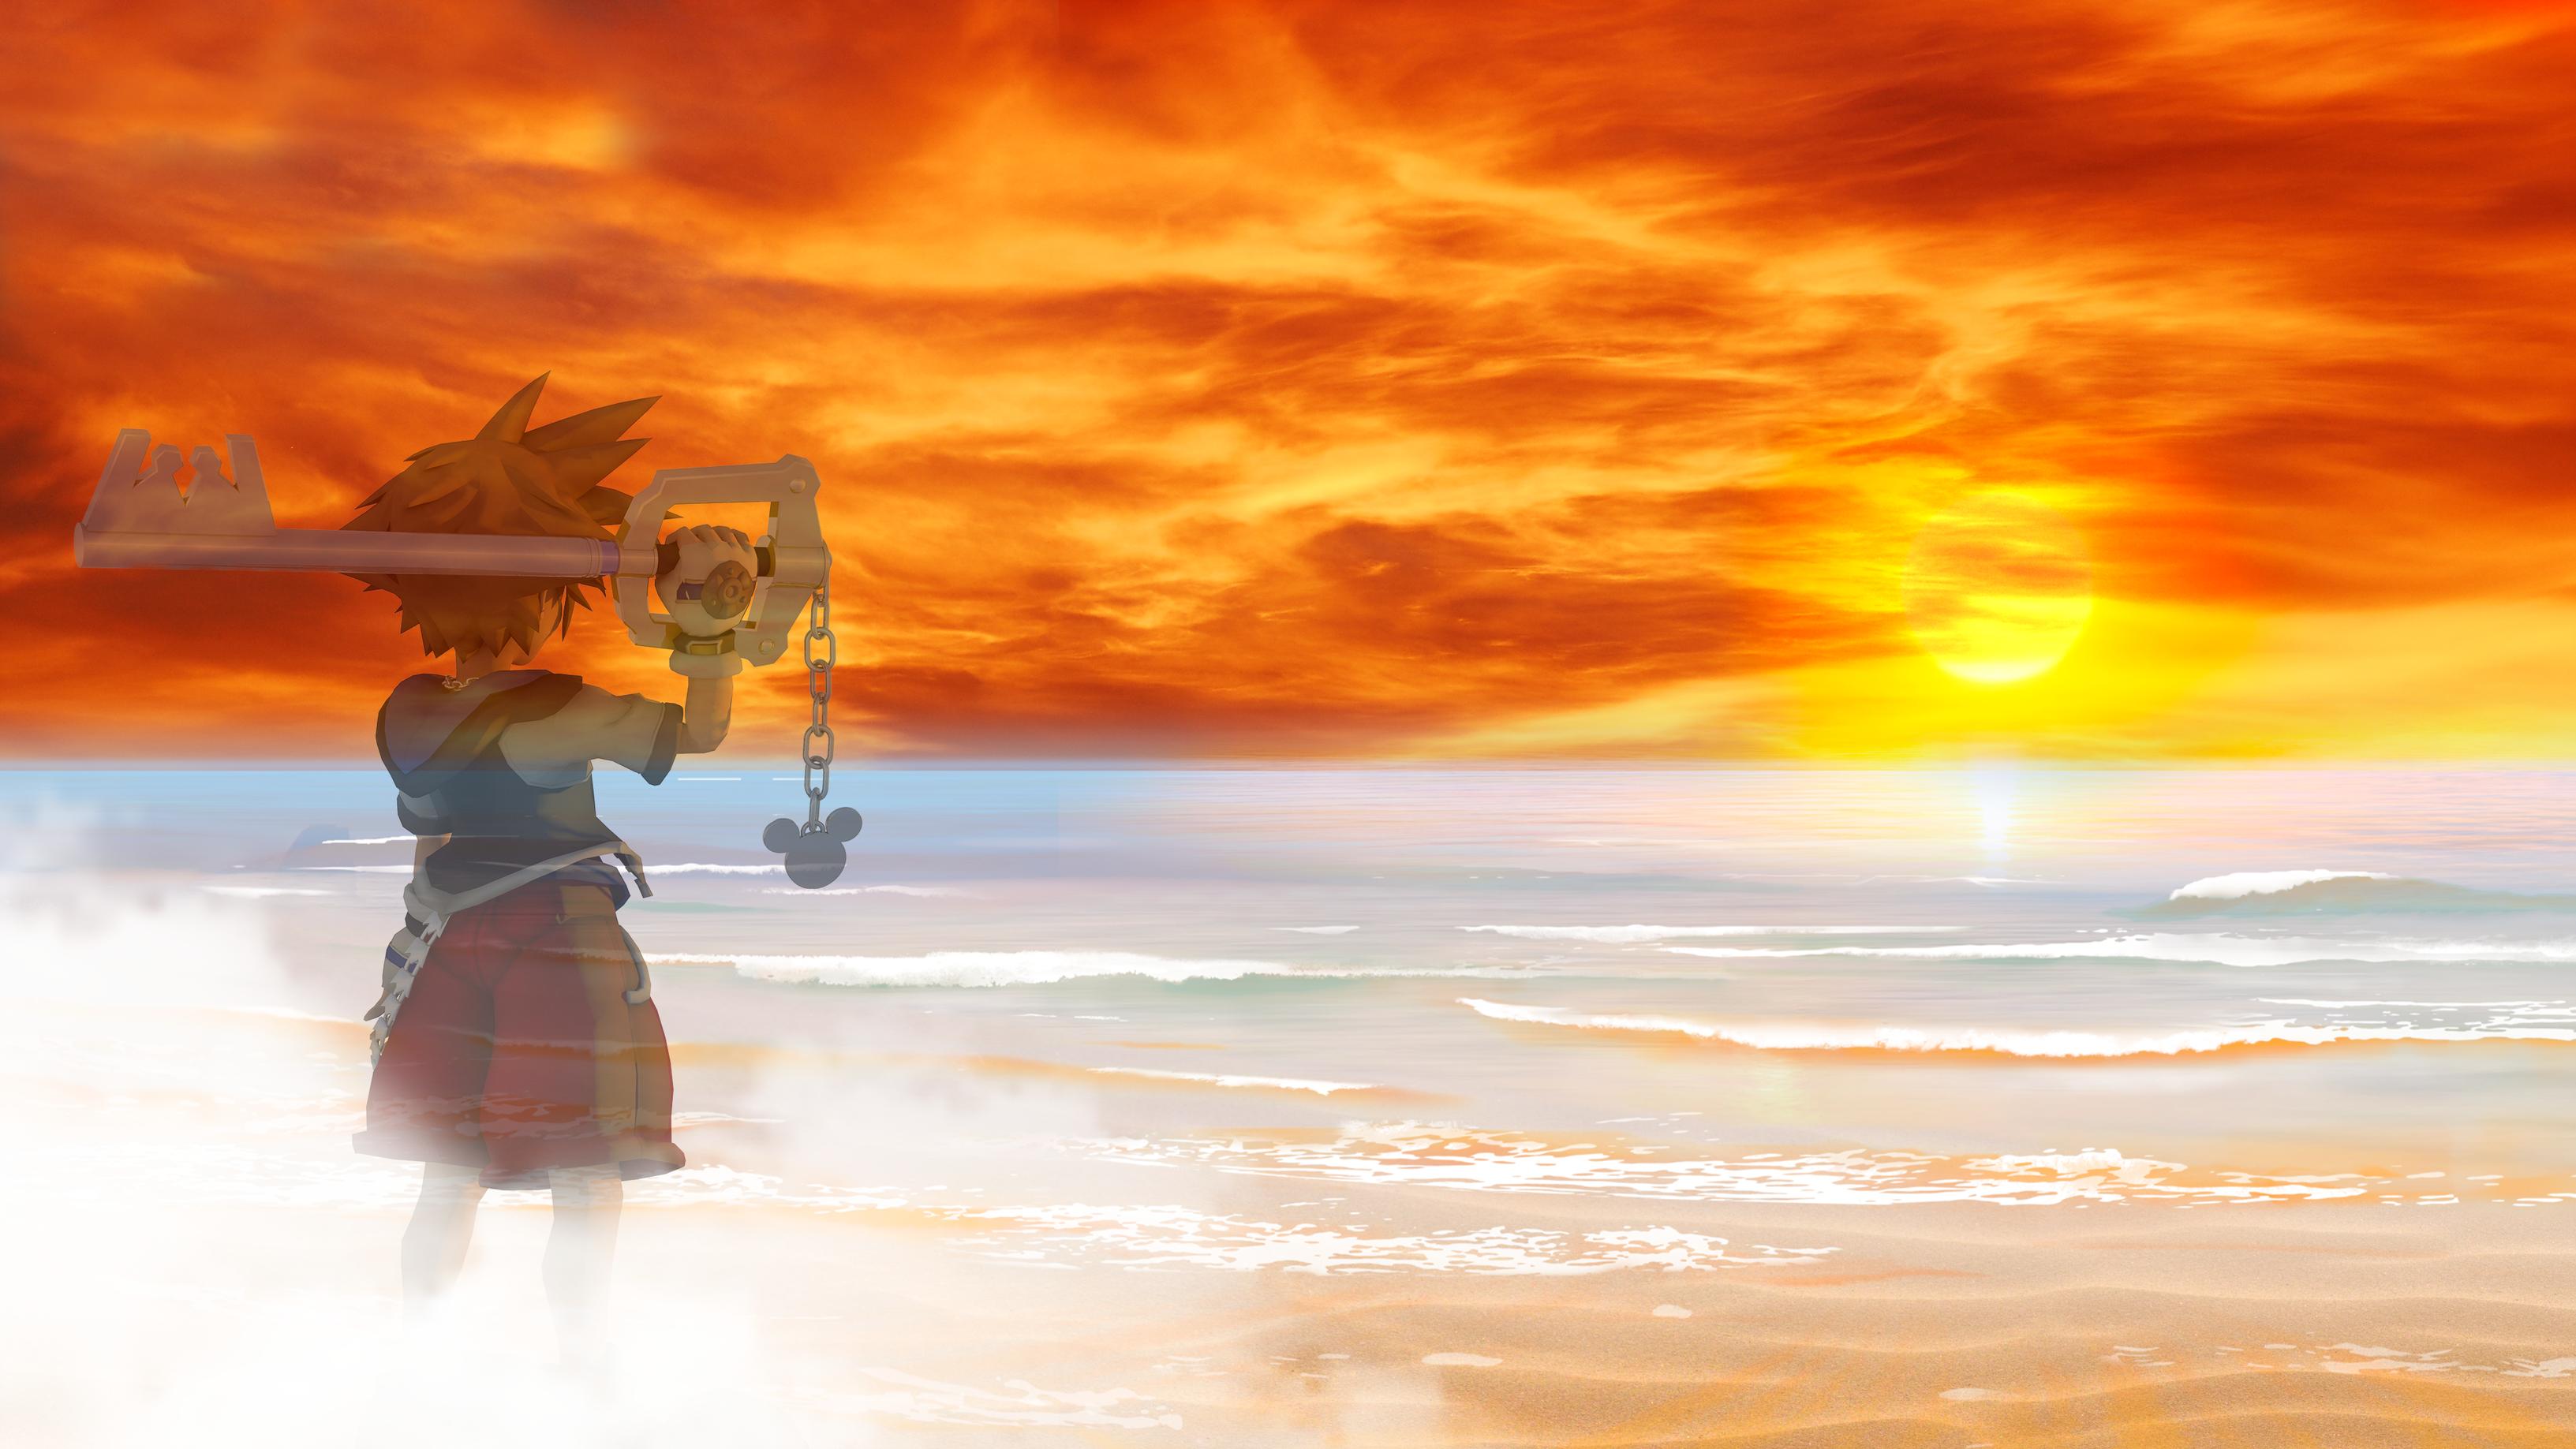 Sora imagining himself at the beach by HaakonHawk